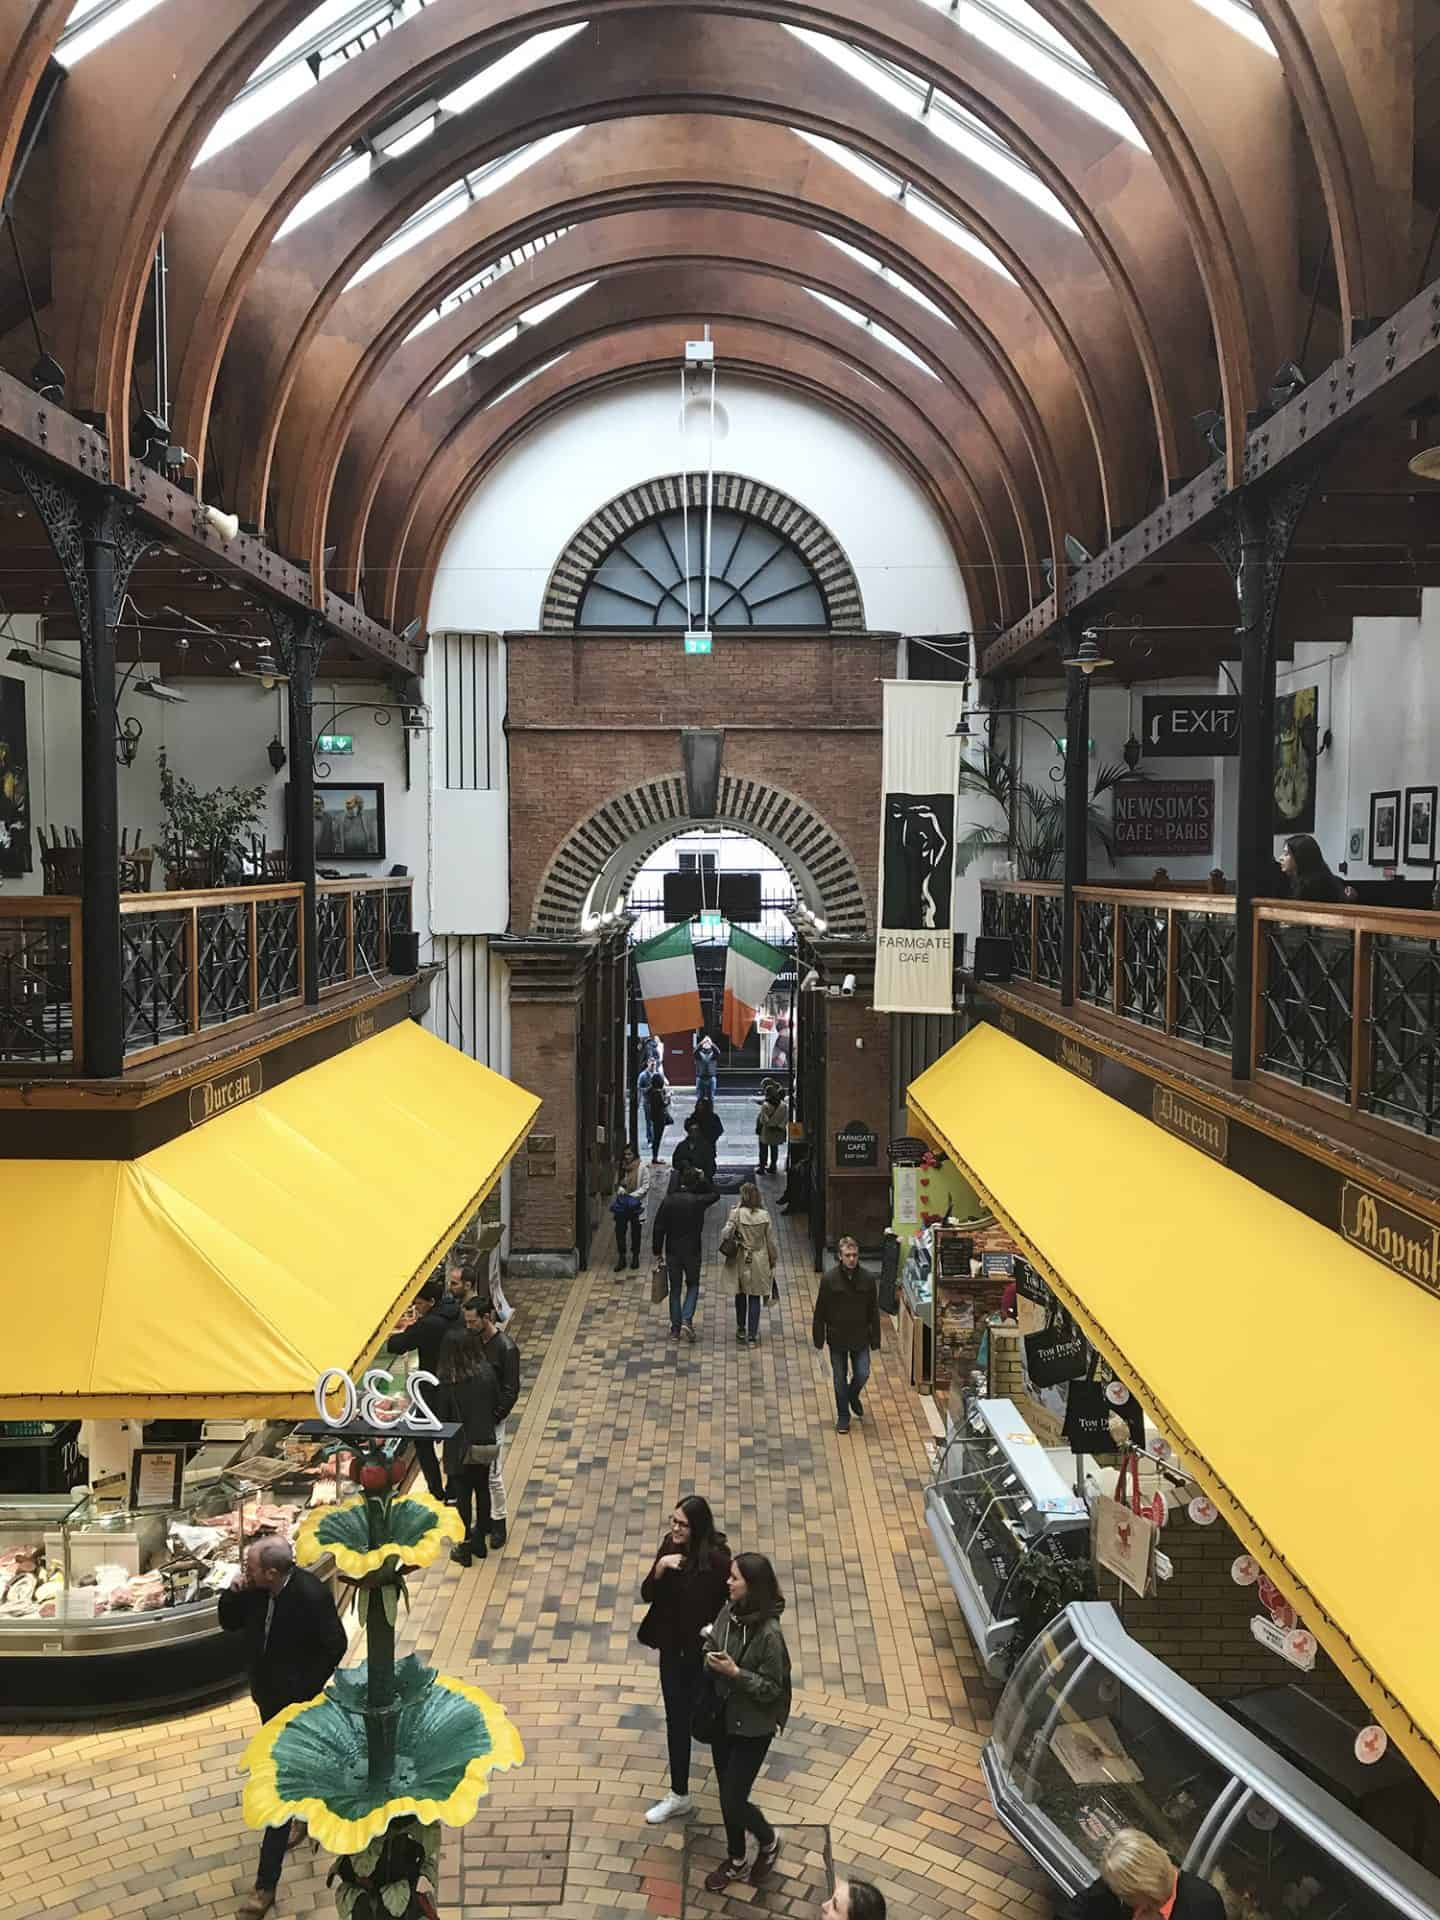 The English Market in Cork, Ireland